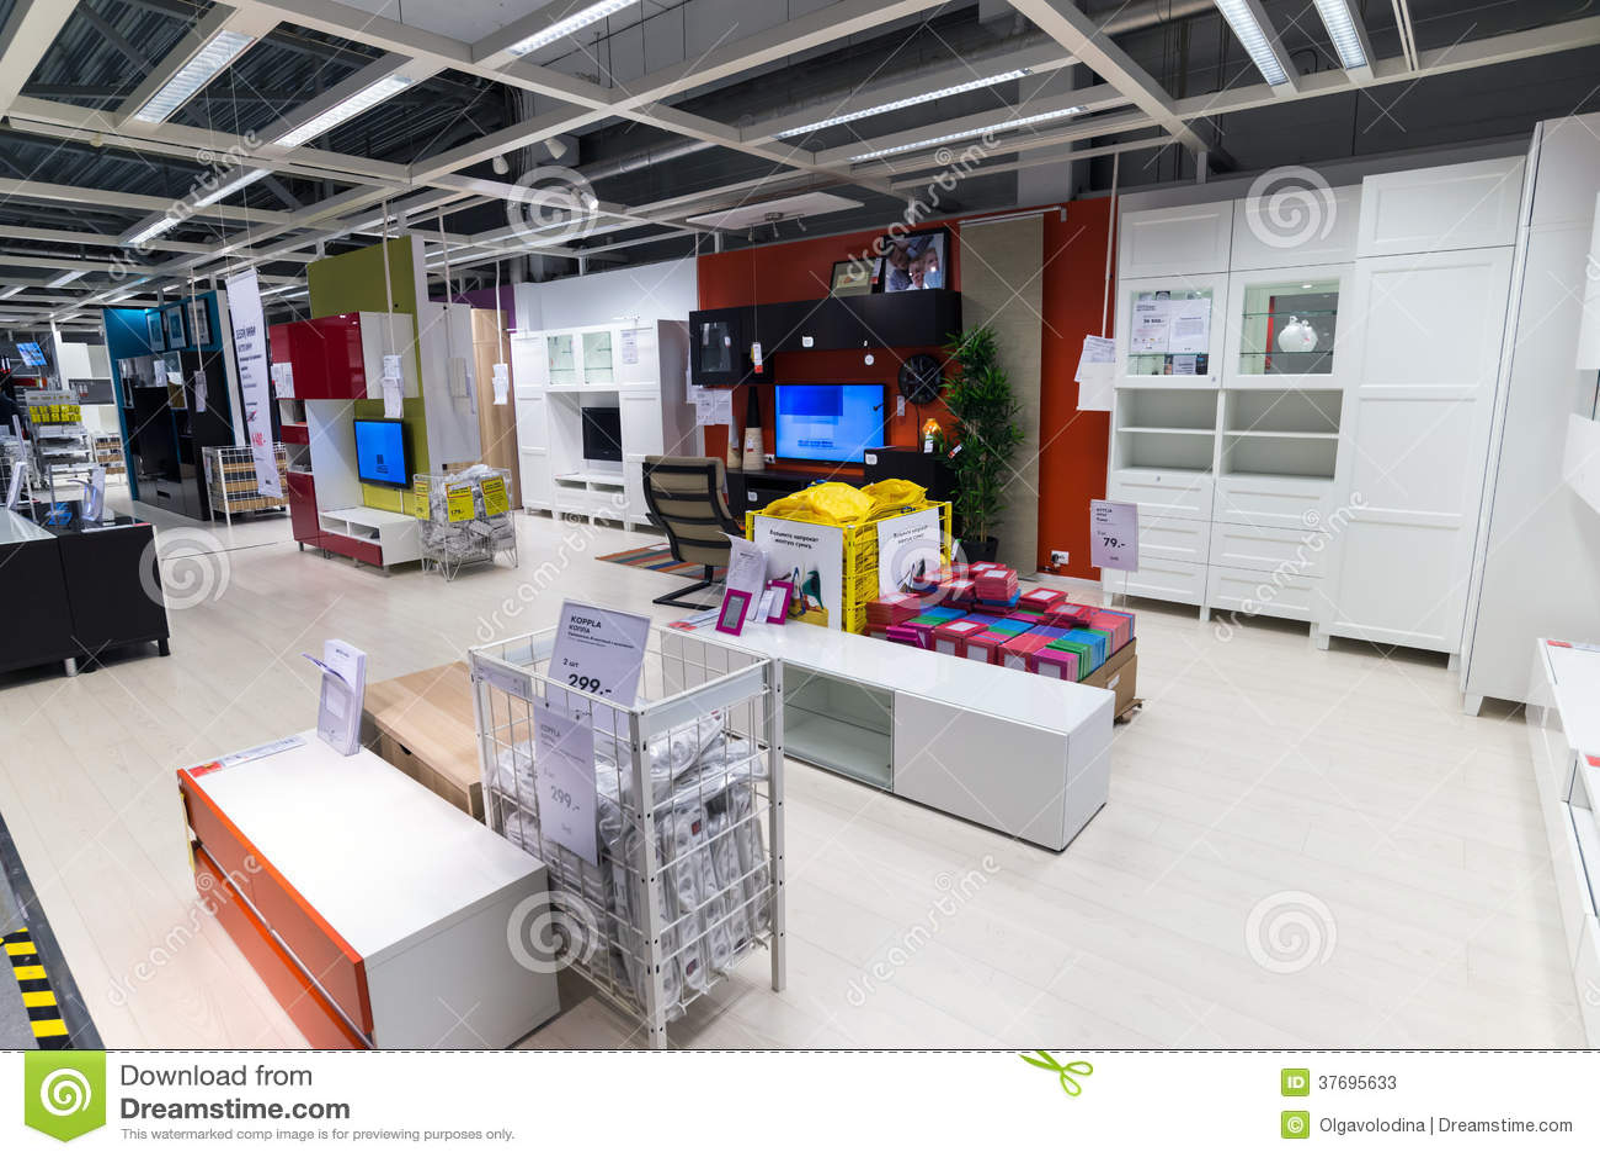 Magasin de meubles int rieur ikea photo stock ditorial for Ameublement interieur